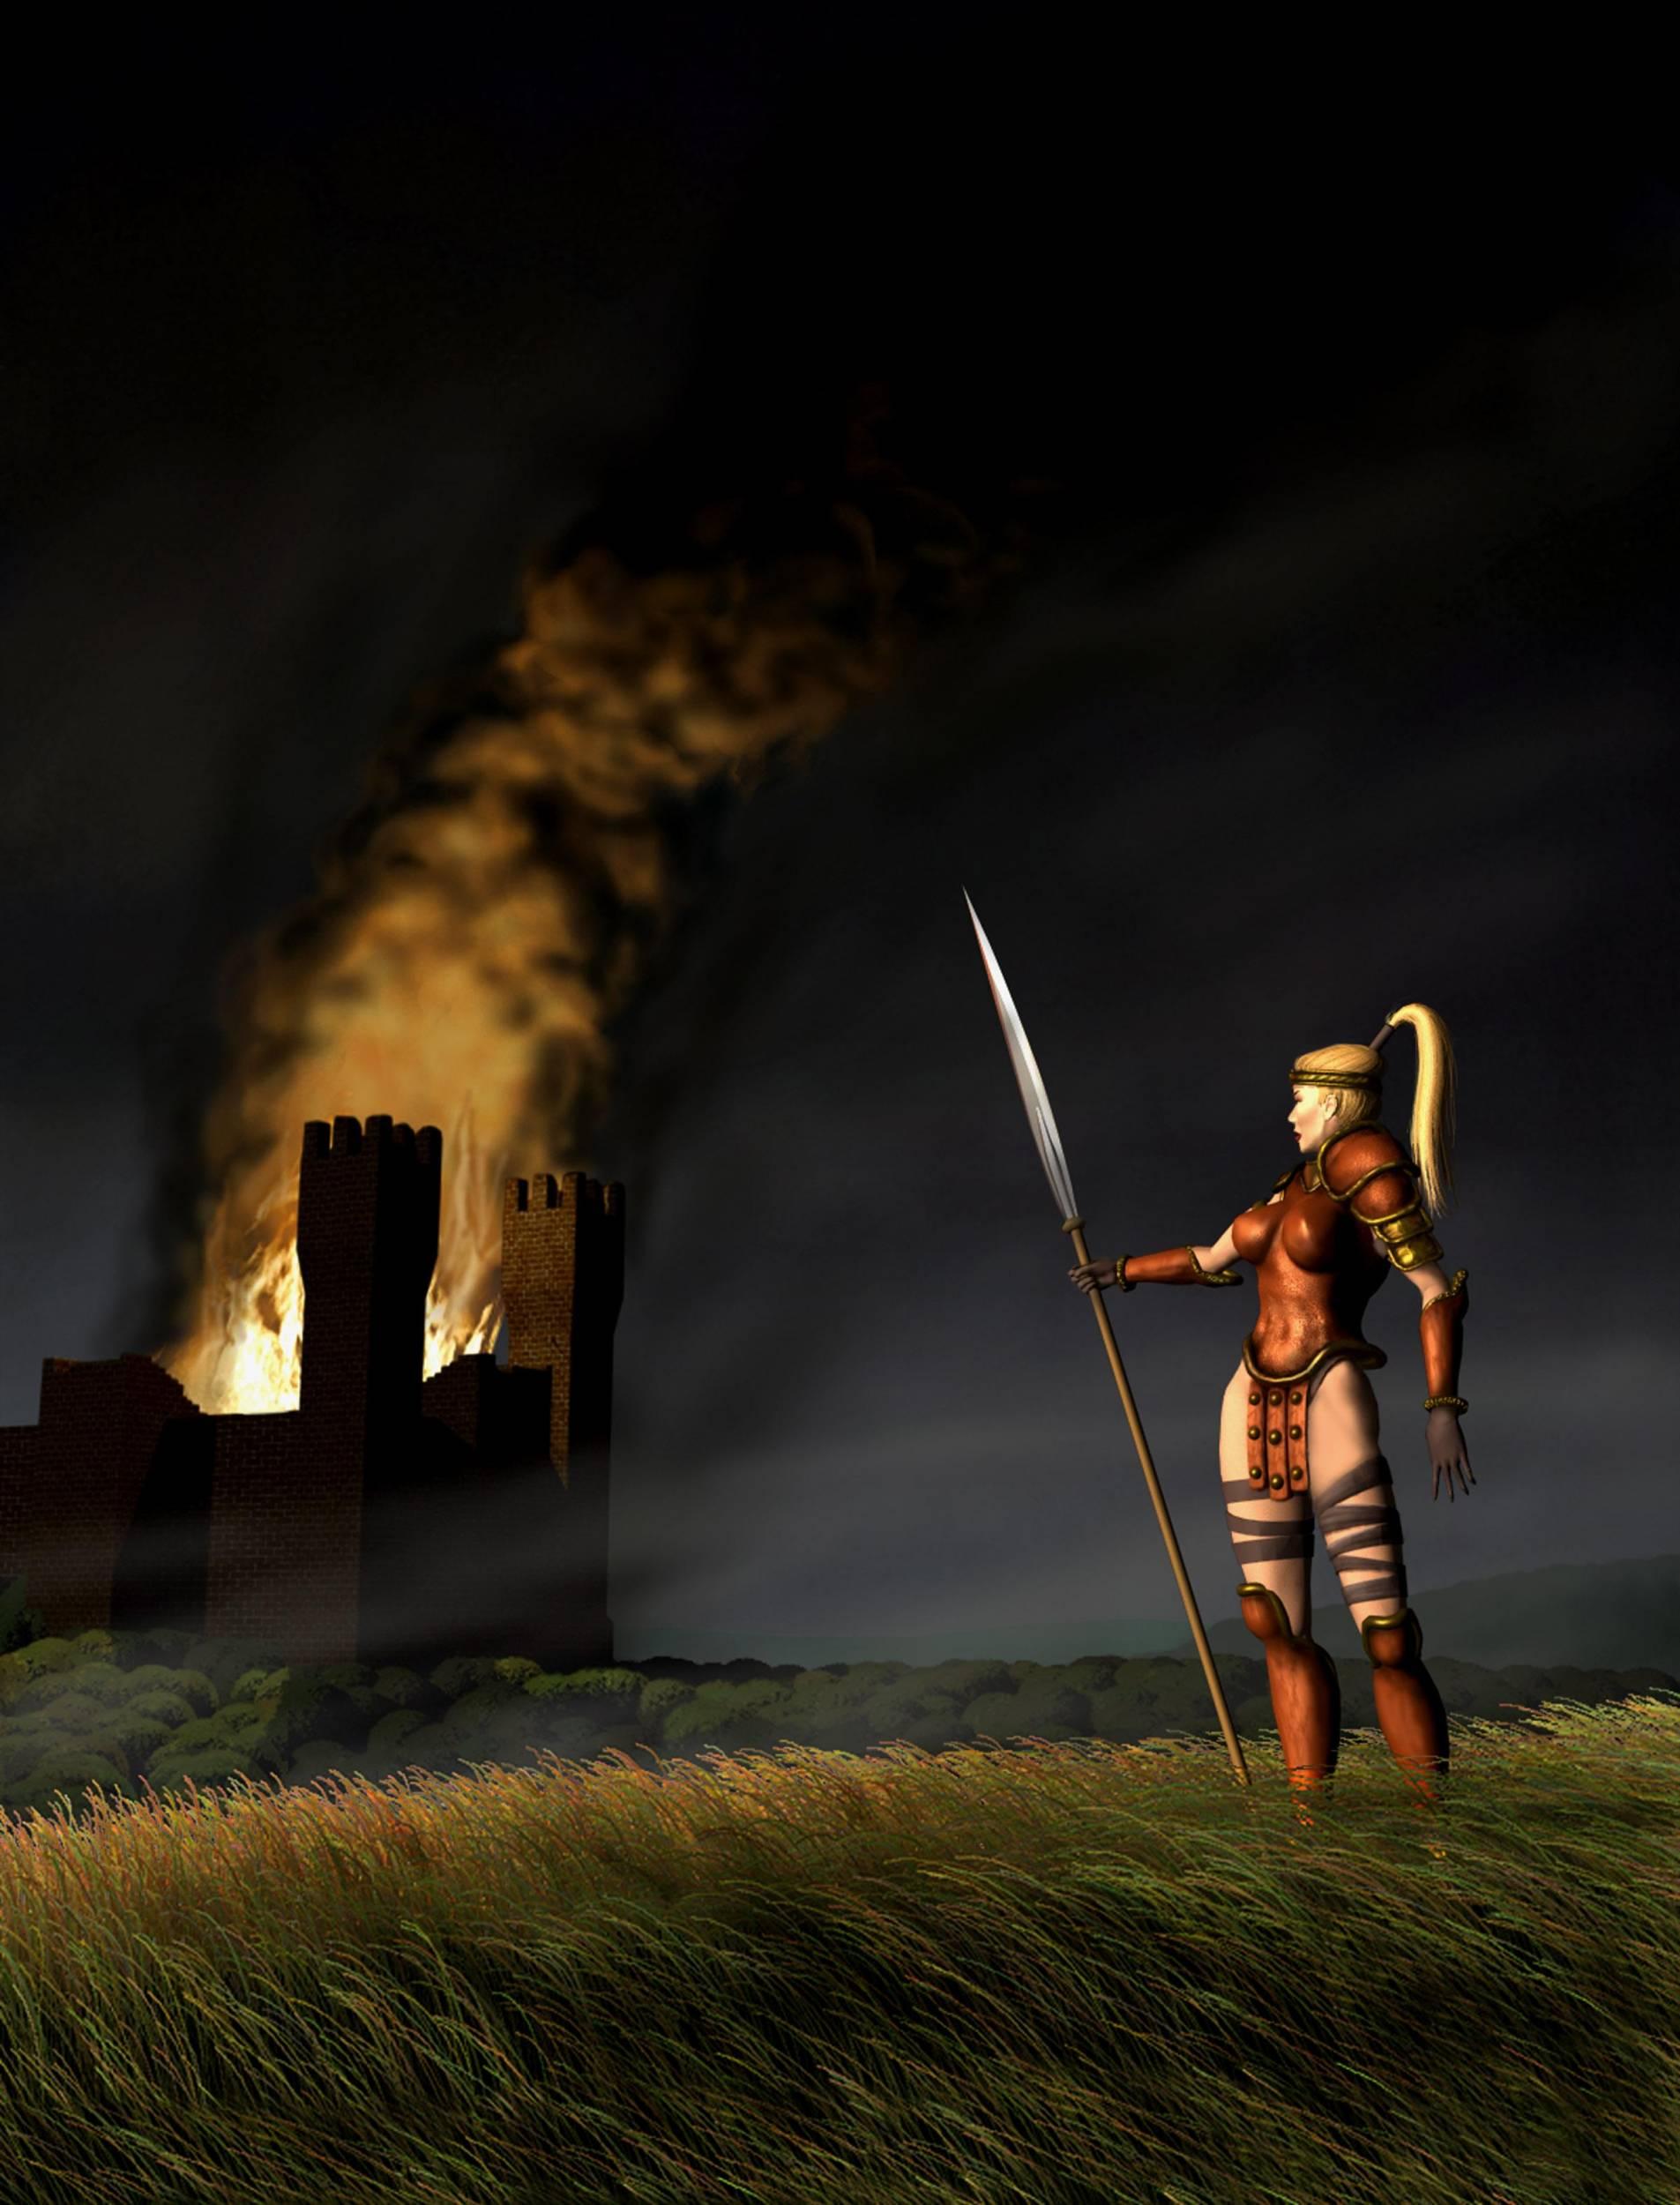 Diablo 2 amazon titties nsfw images